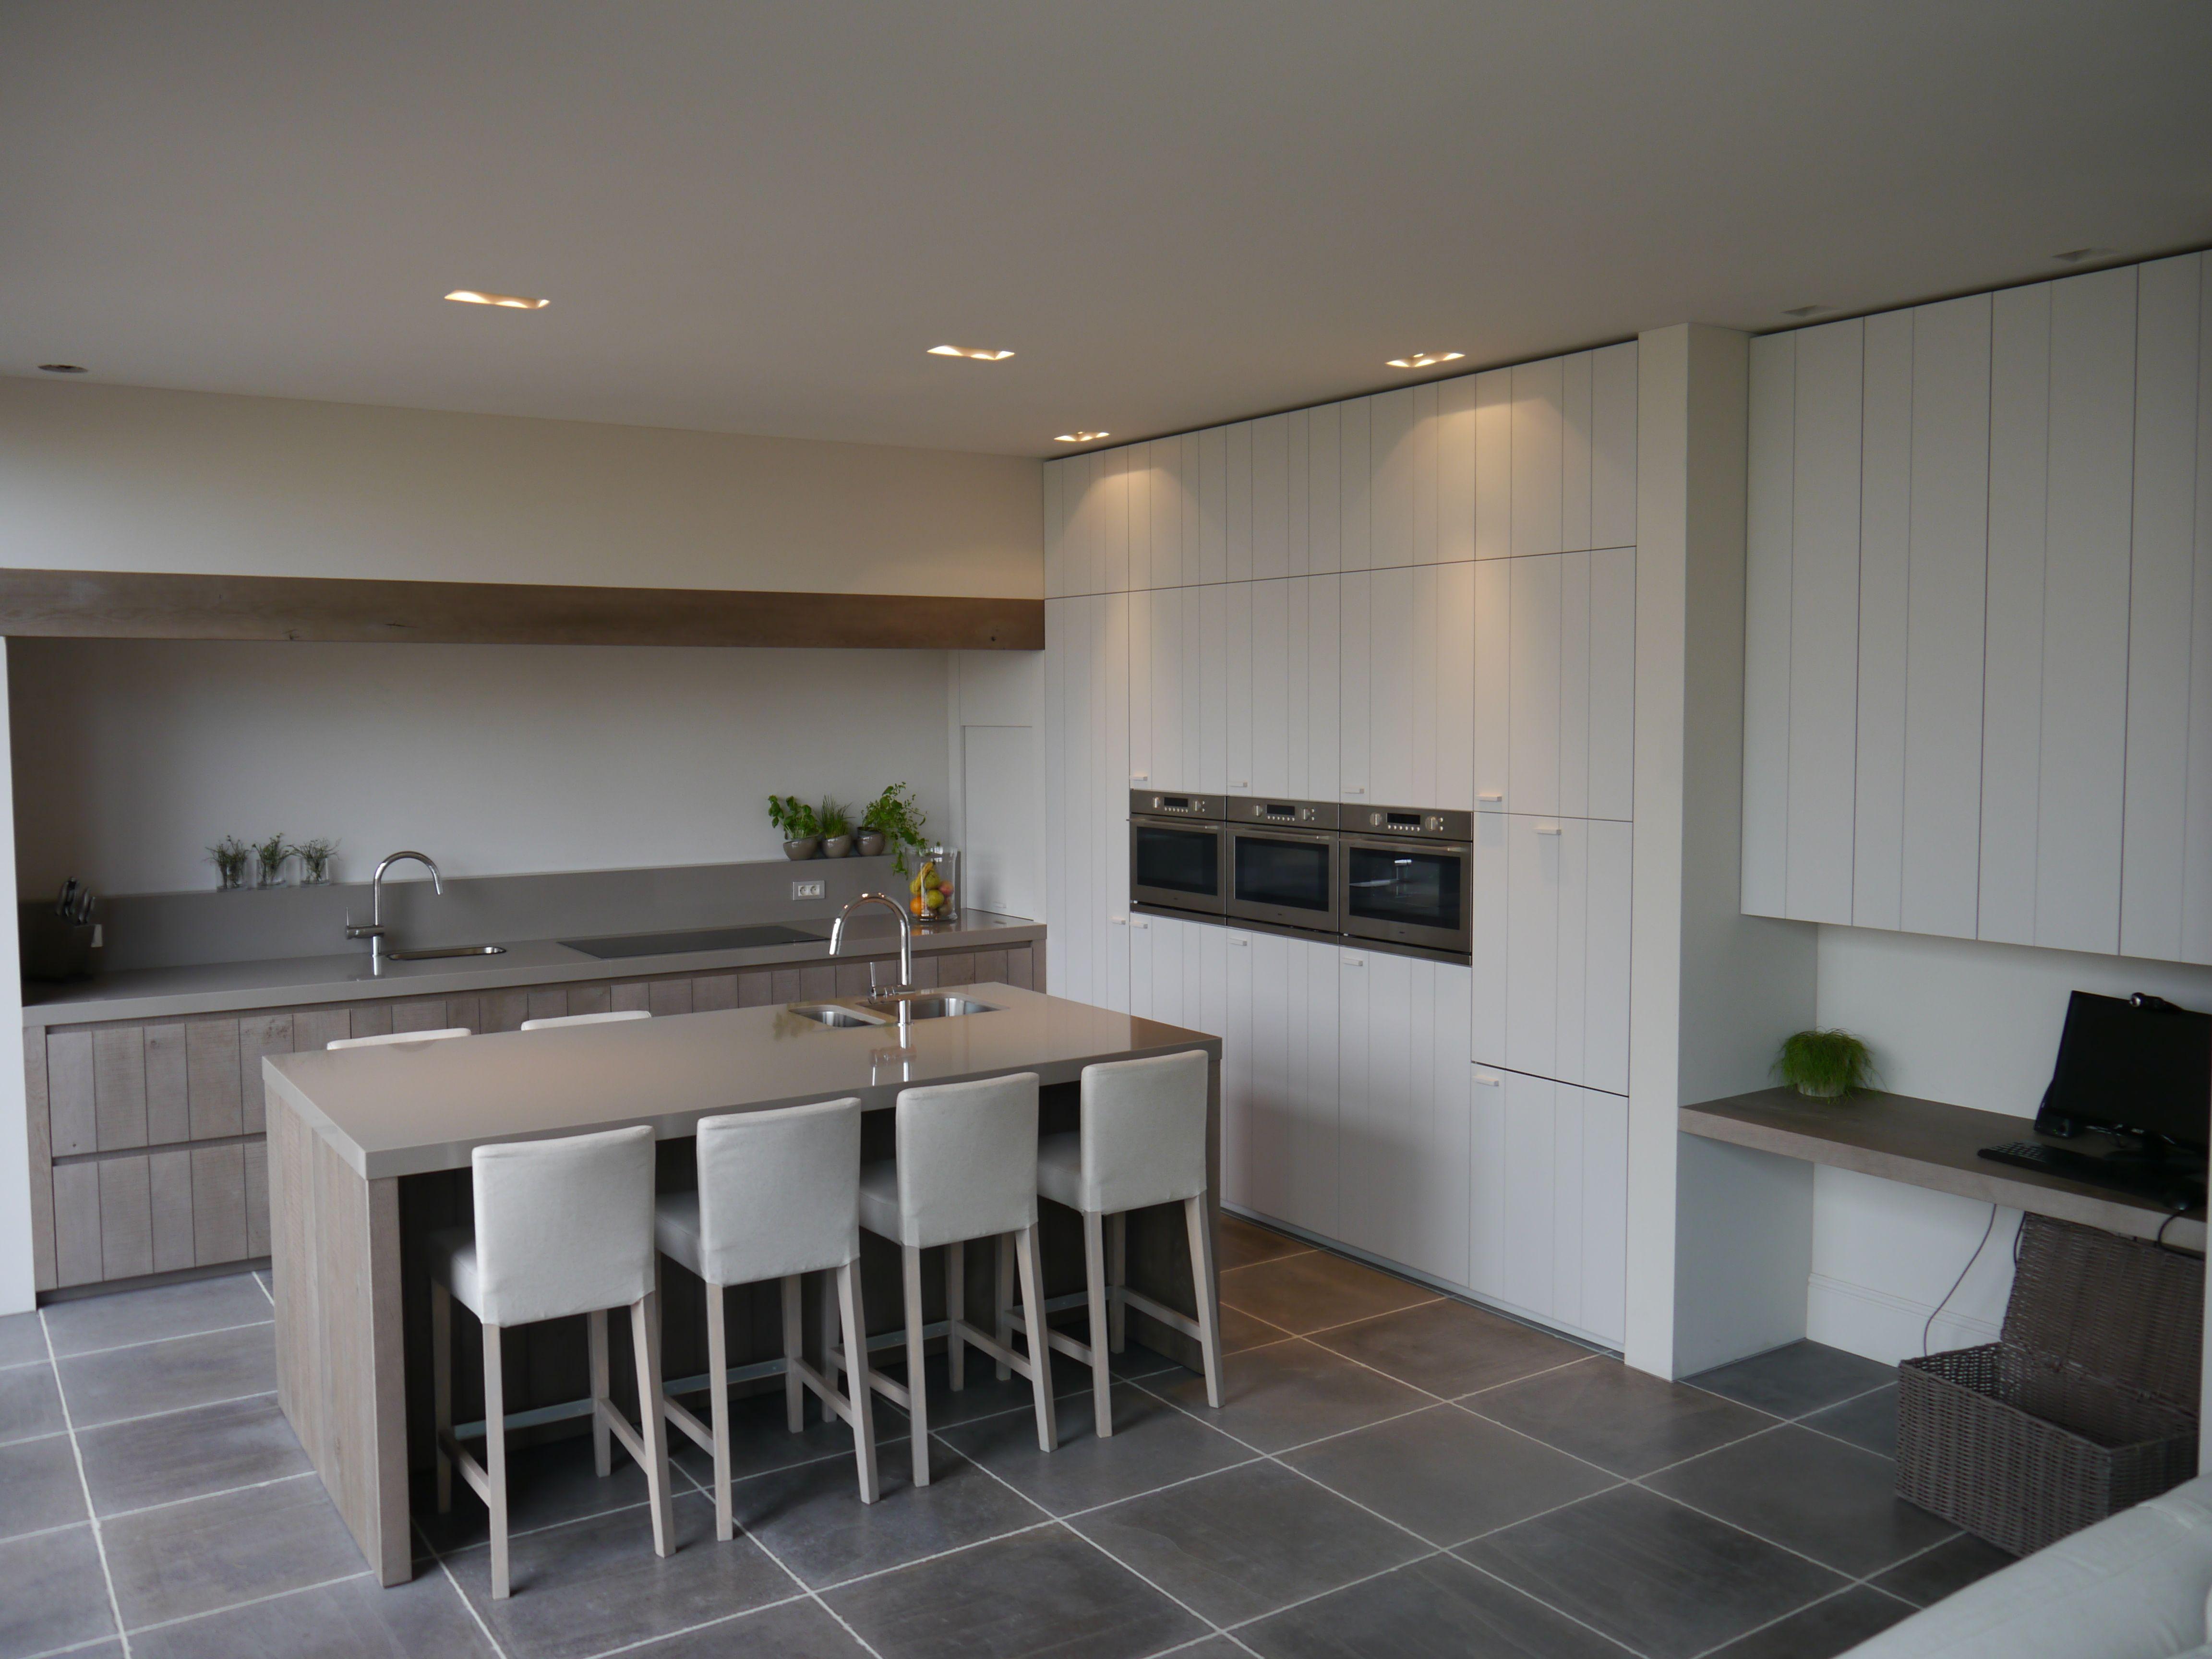 Landelijk Keuken Strakke : Keuken landelijk strak interieurarchitect charlotte van bruwaene